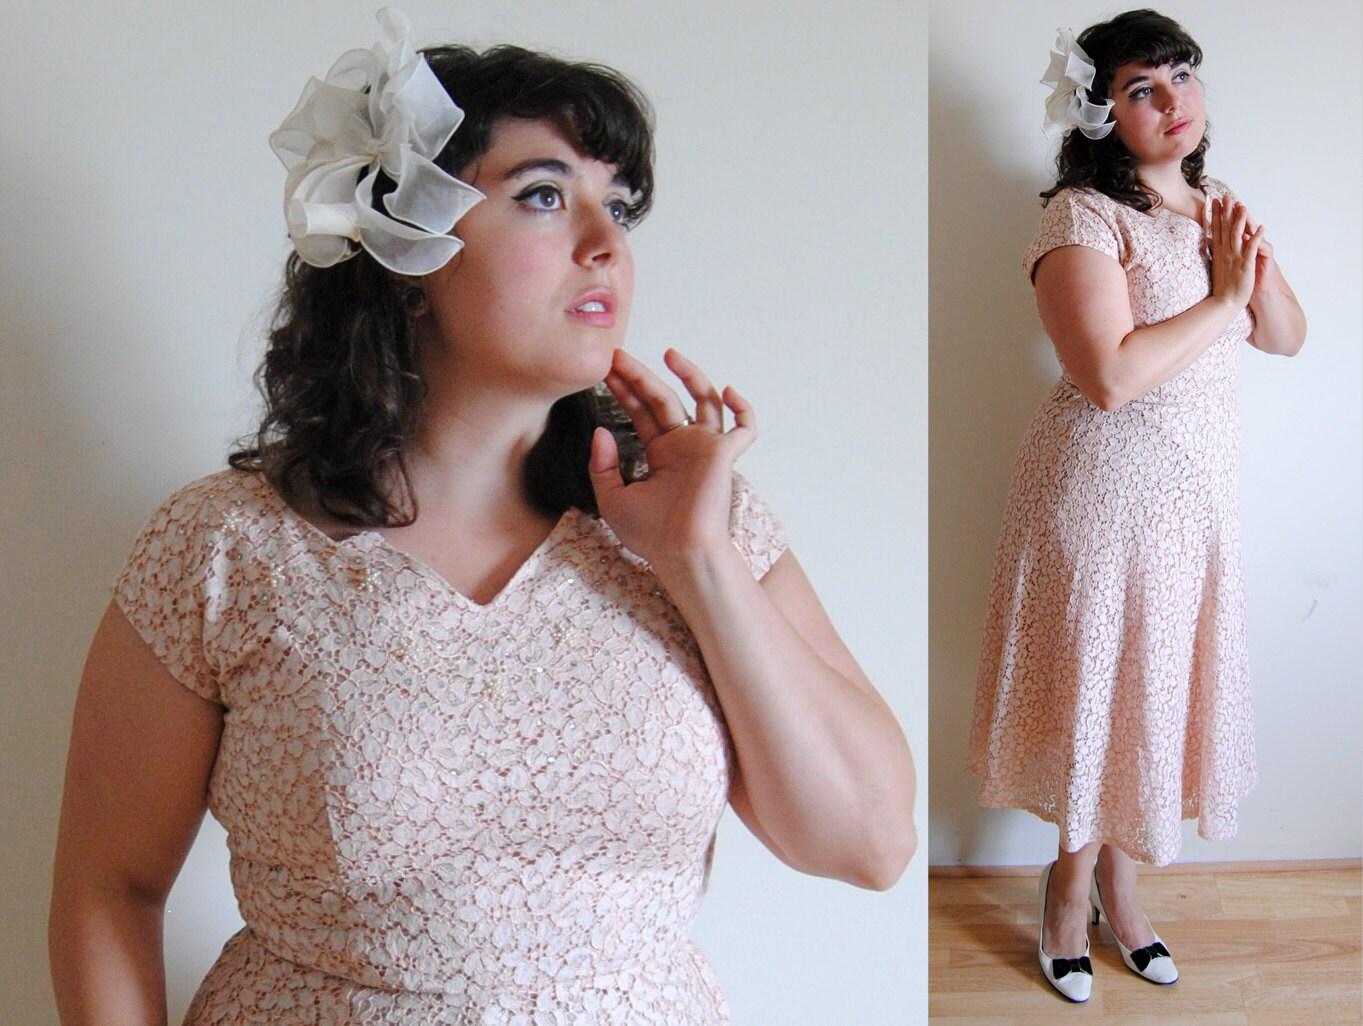 SALE Plus Size Vintage Dress 1940s 1950s Pink Lace Dress with